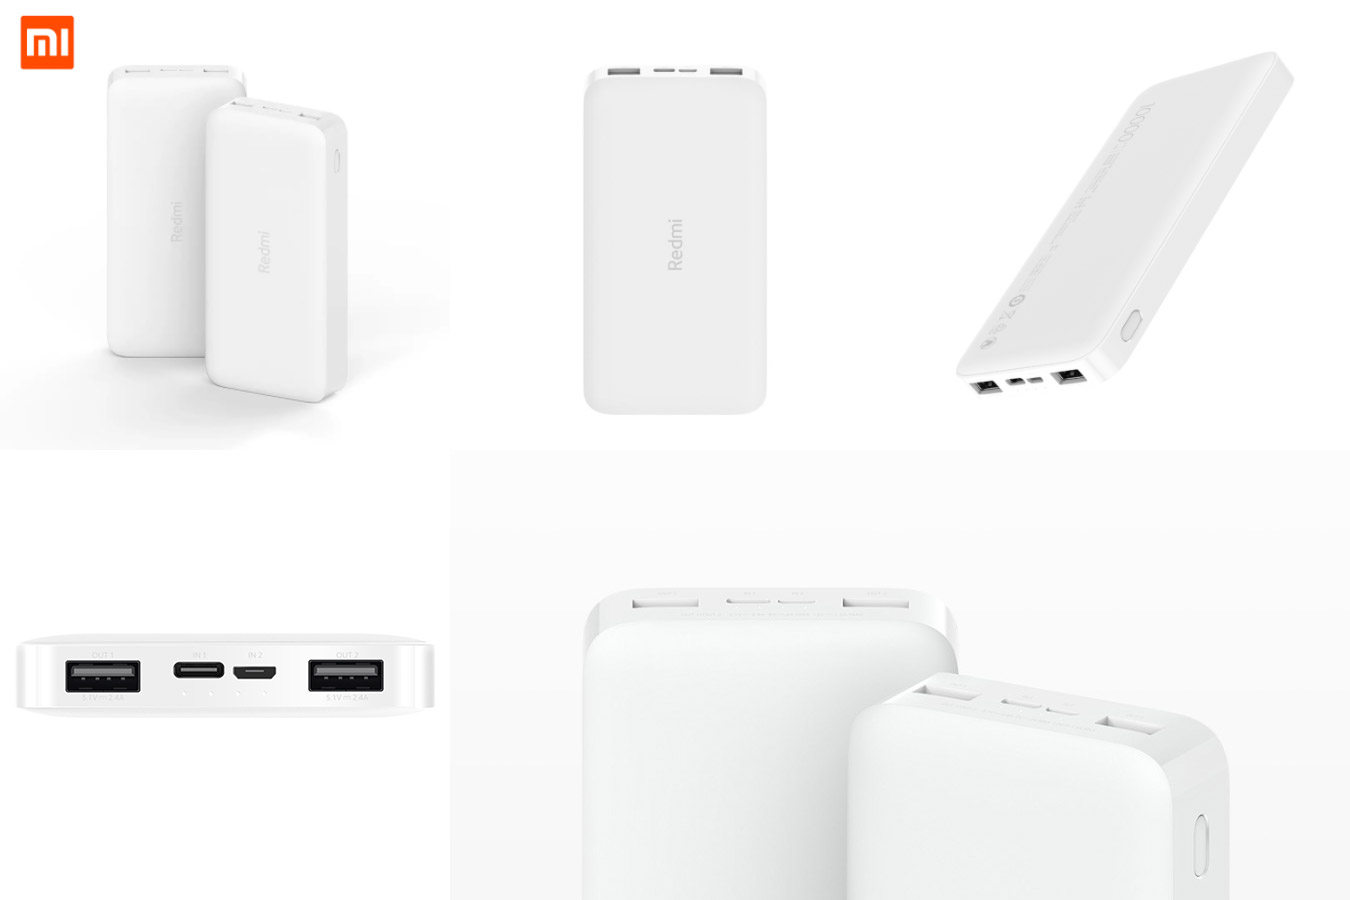 Стильный аккумулятор Redmi power bank